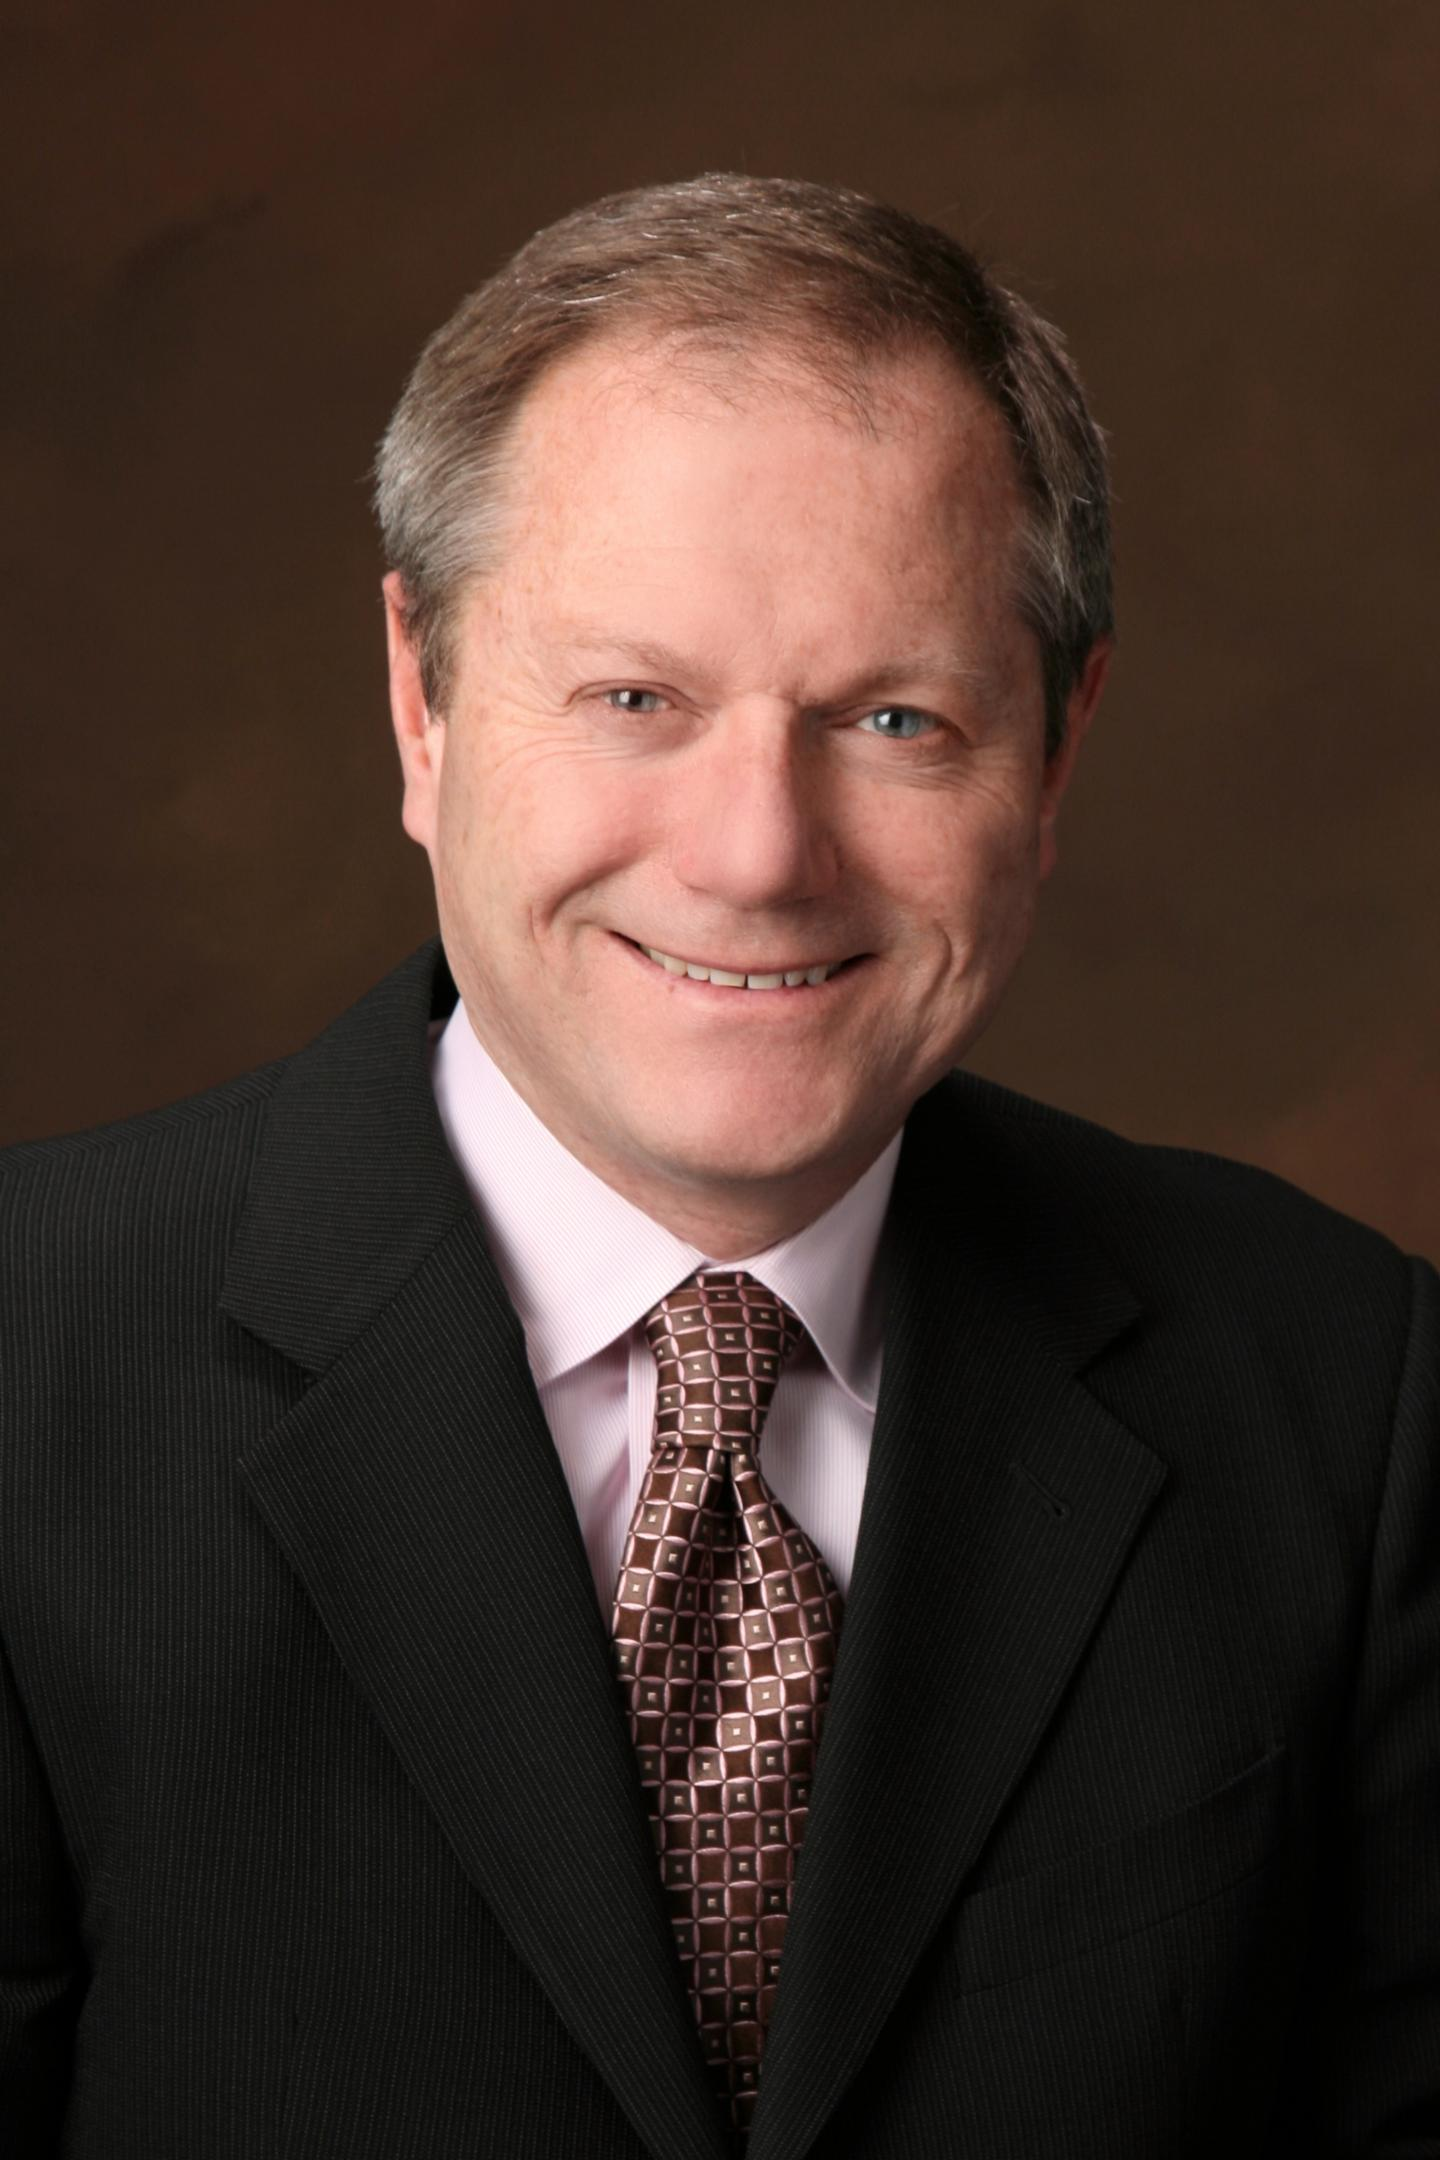 Todd Semla, PharmD, MS, AGSF, American Geriatrics Society